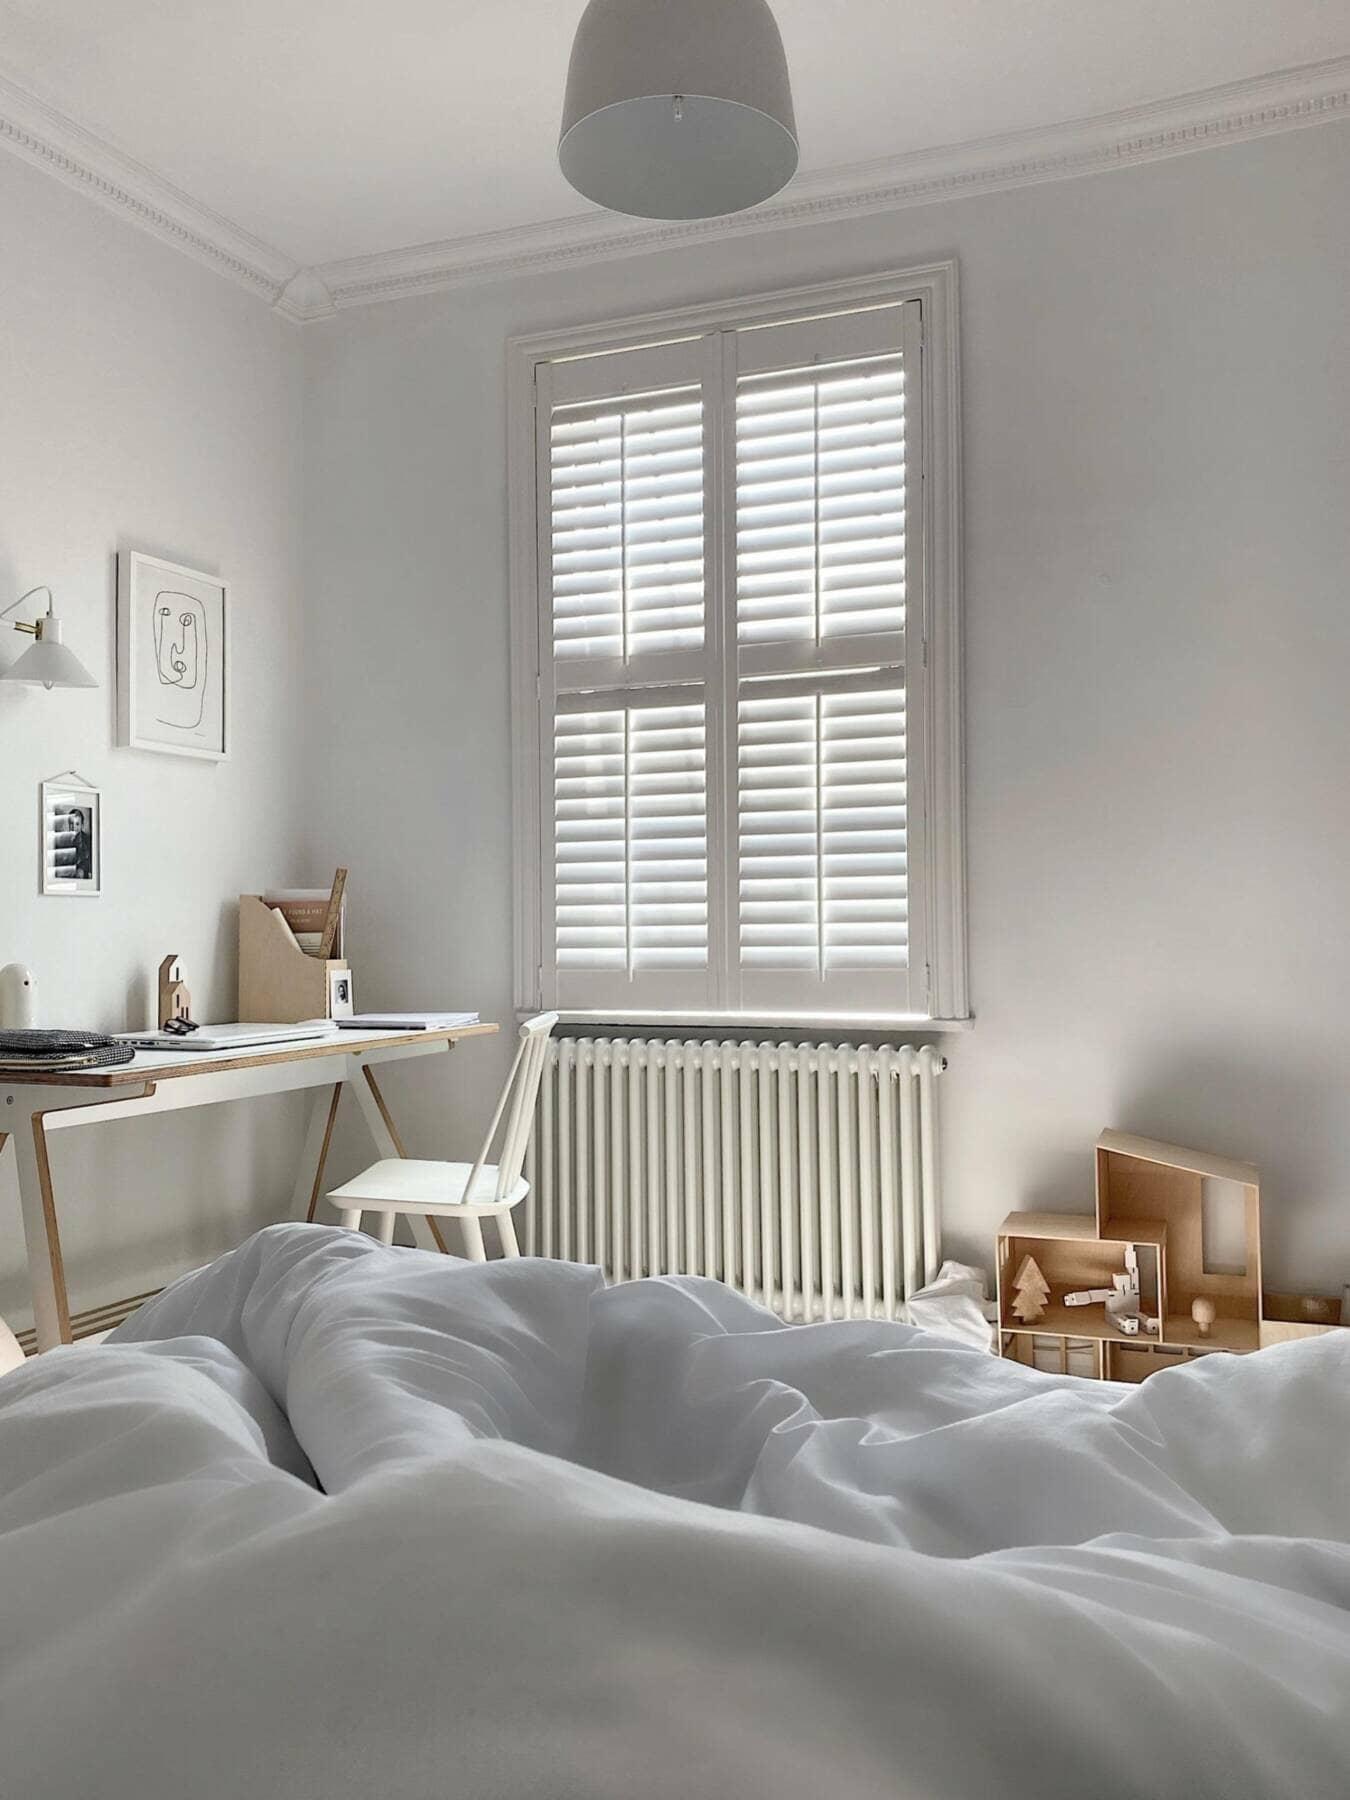 jonnie's bedroom with a radiator under the window